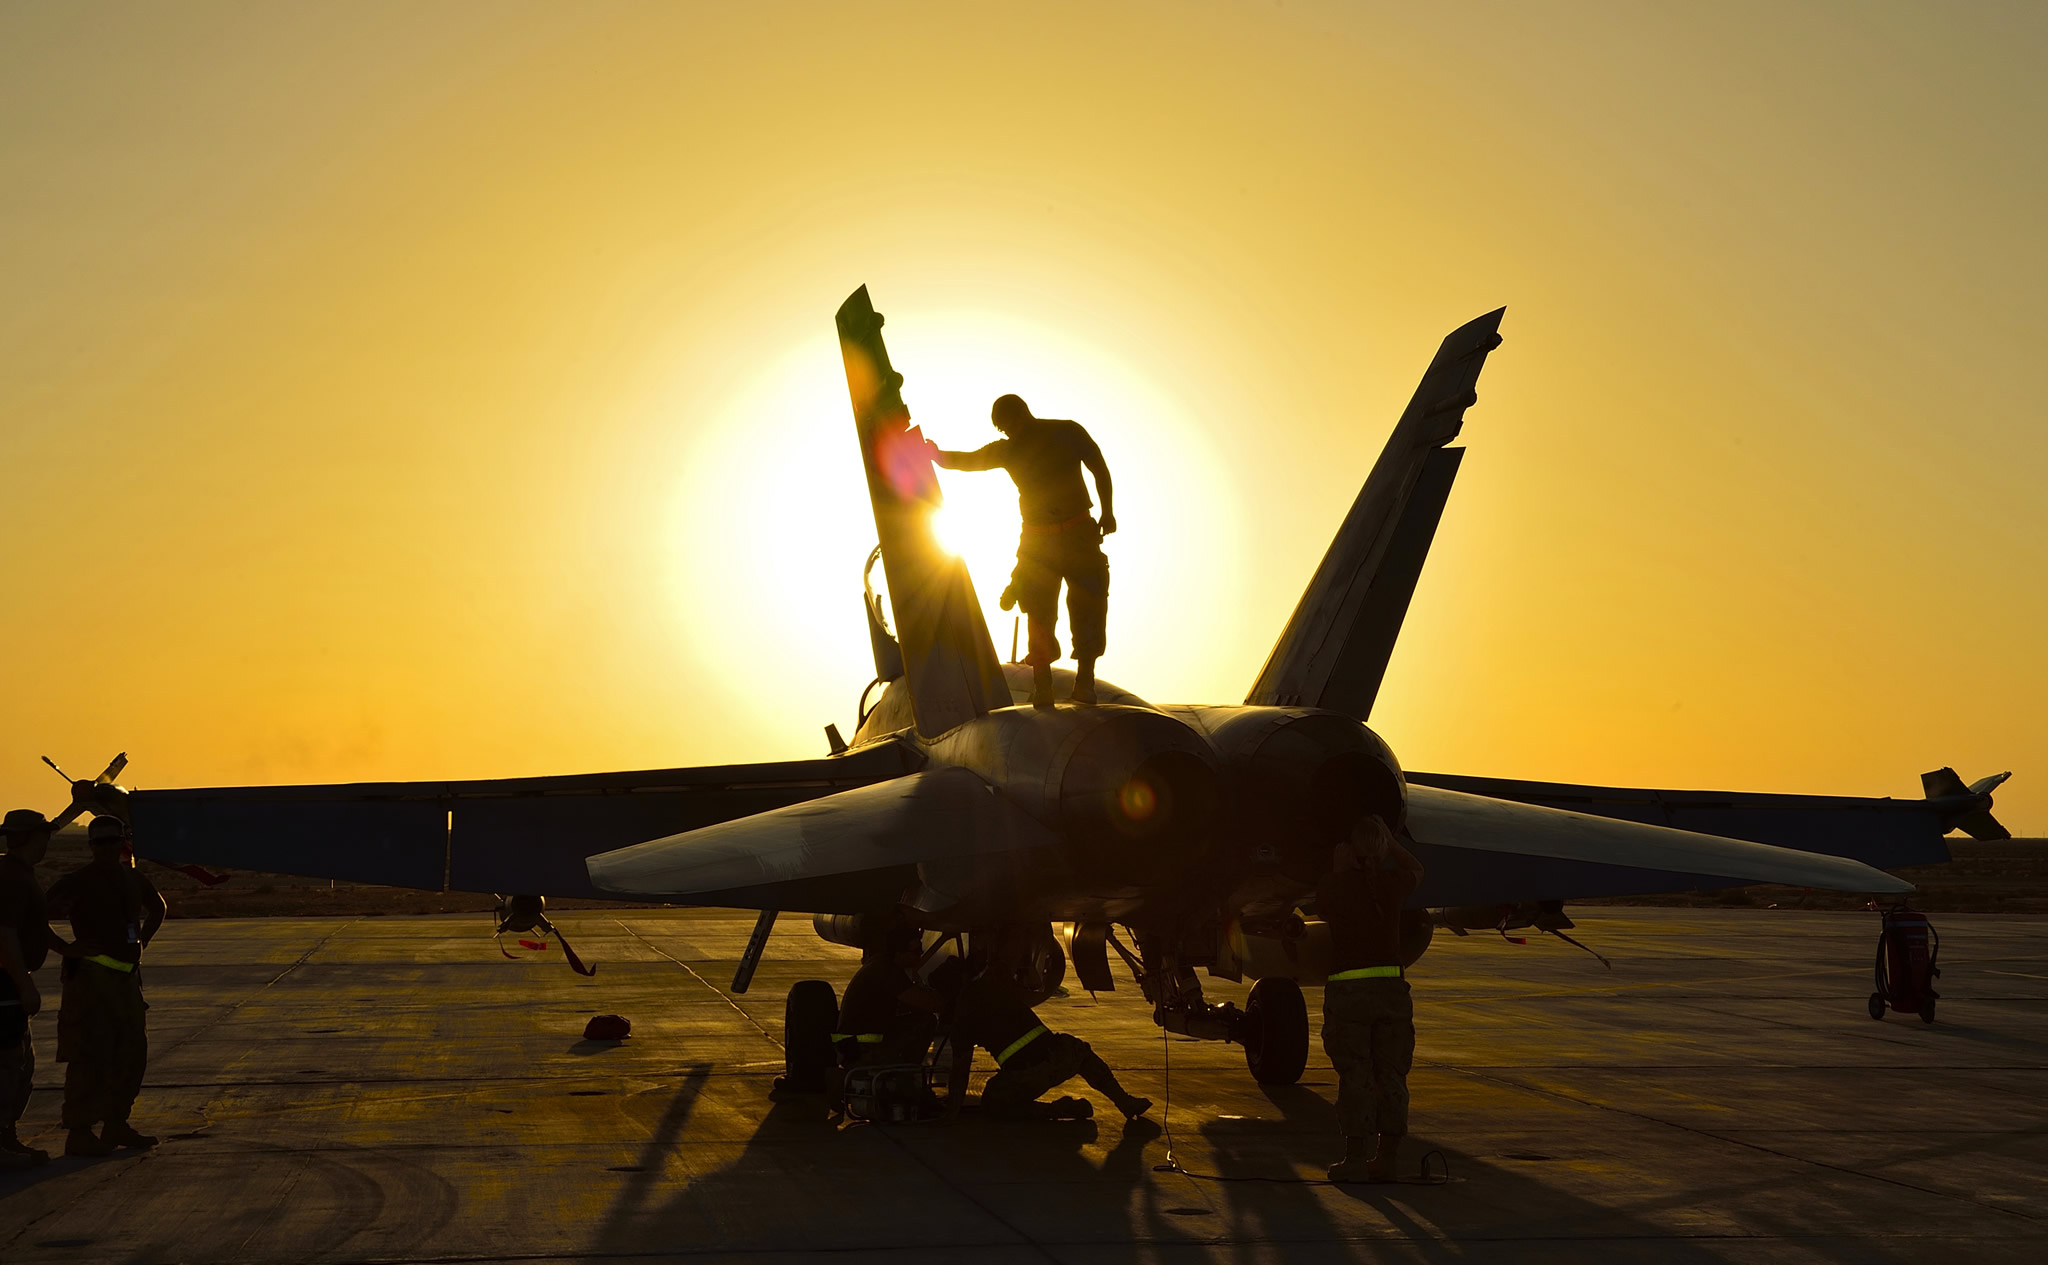 Kuwait Royal Canadian Air Force Ground Crew Perform Post Flight Checks